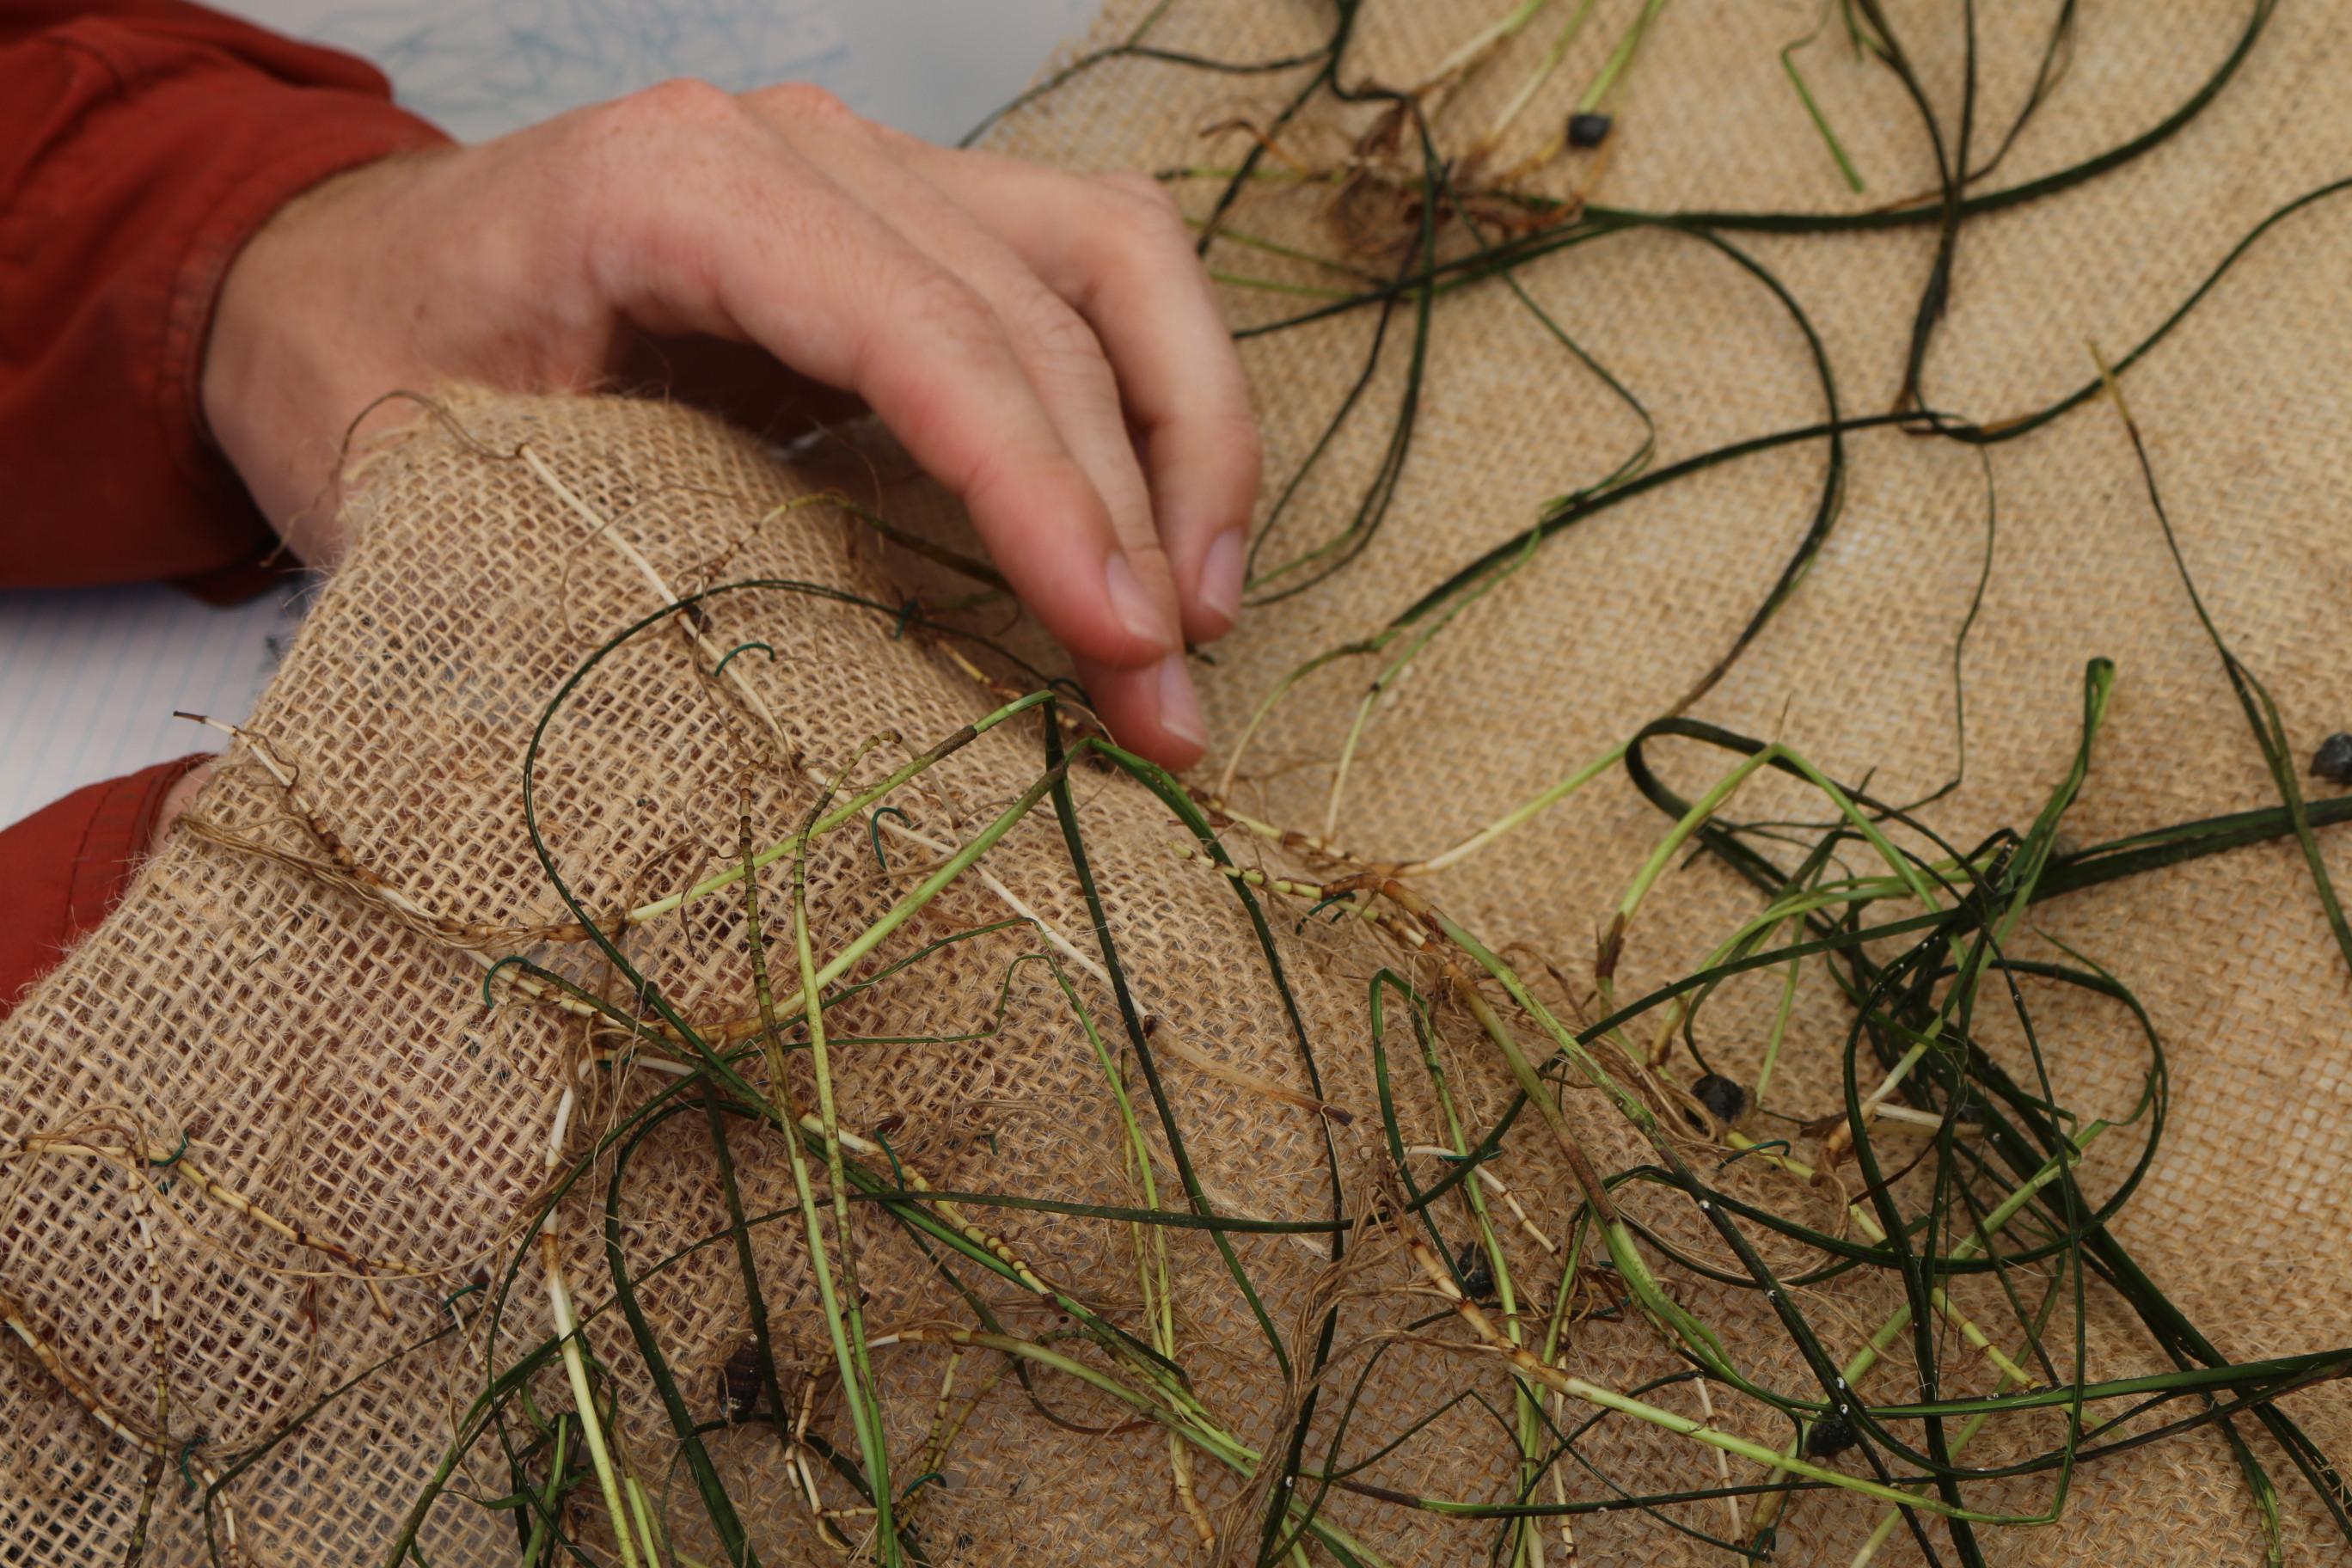 Seagrass transplant mat